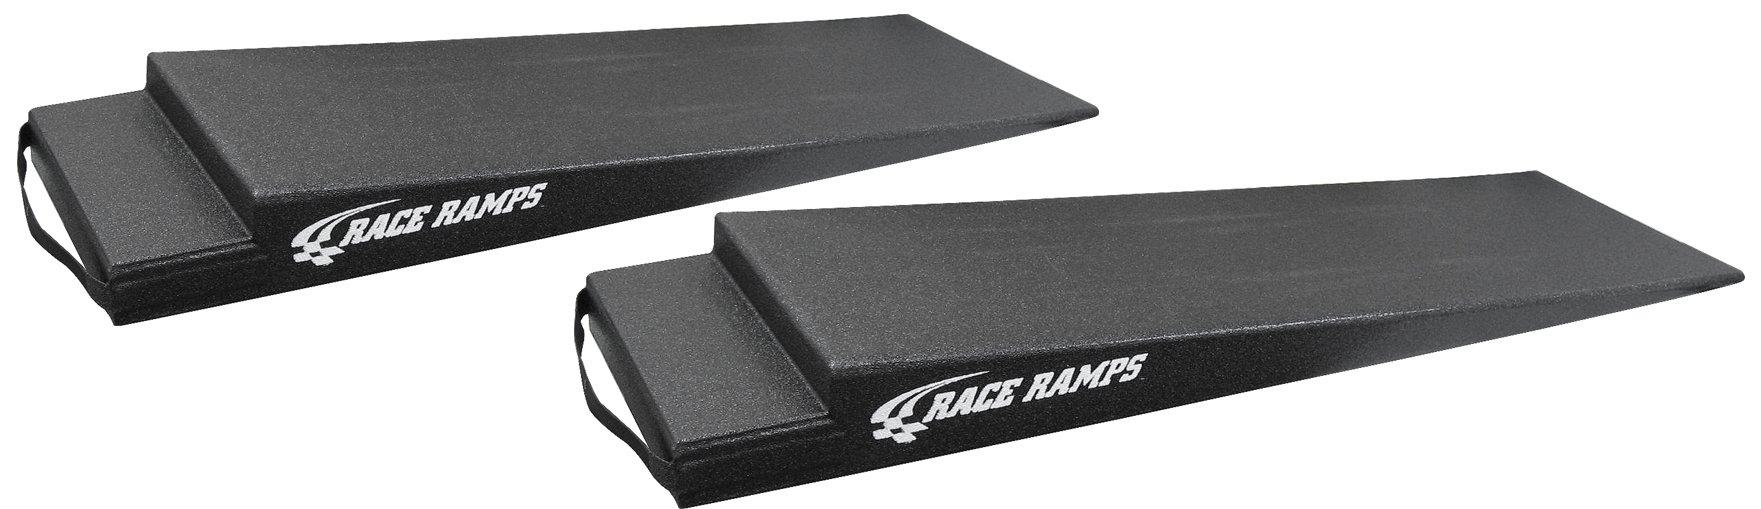 "Race Ramps RR-TR-4 4"" Trailer Ramp"